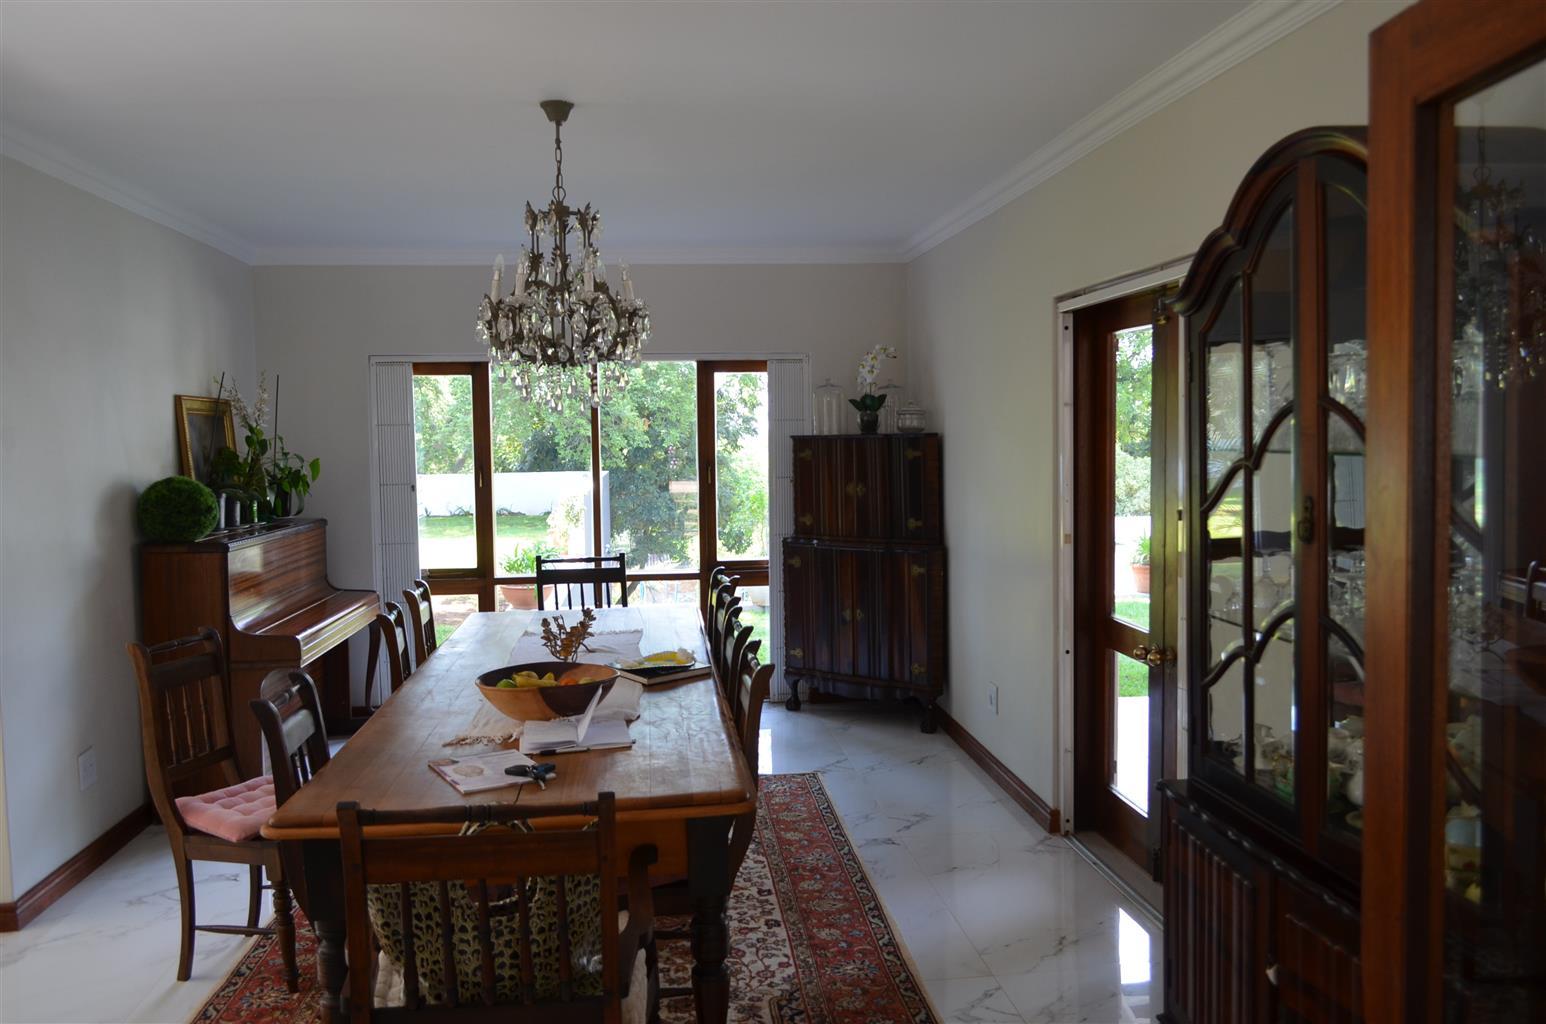 House to Let in Waterkloof Ridge, Pretoria